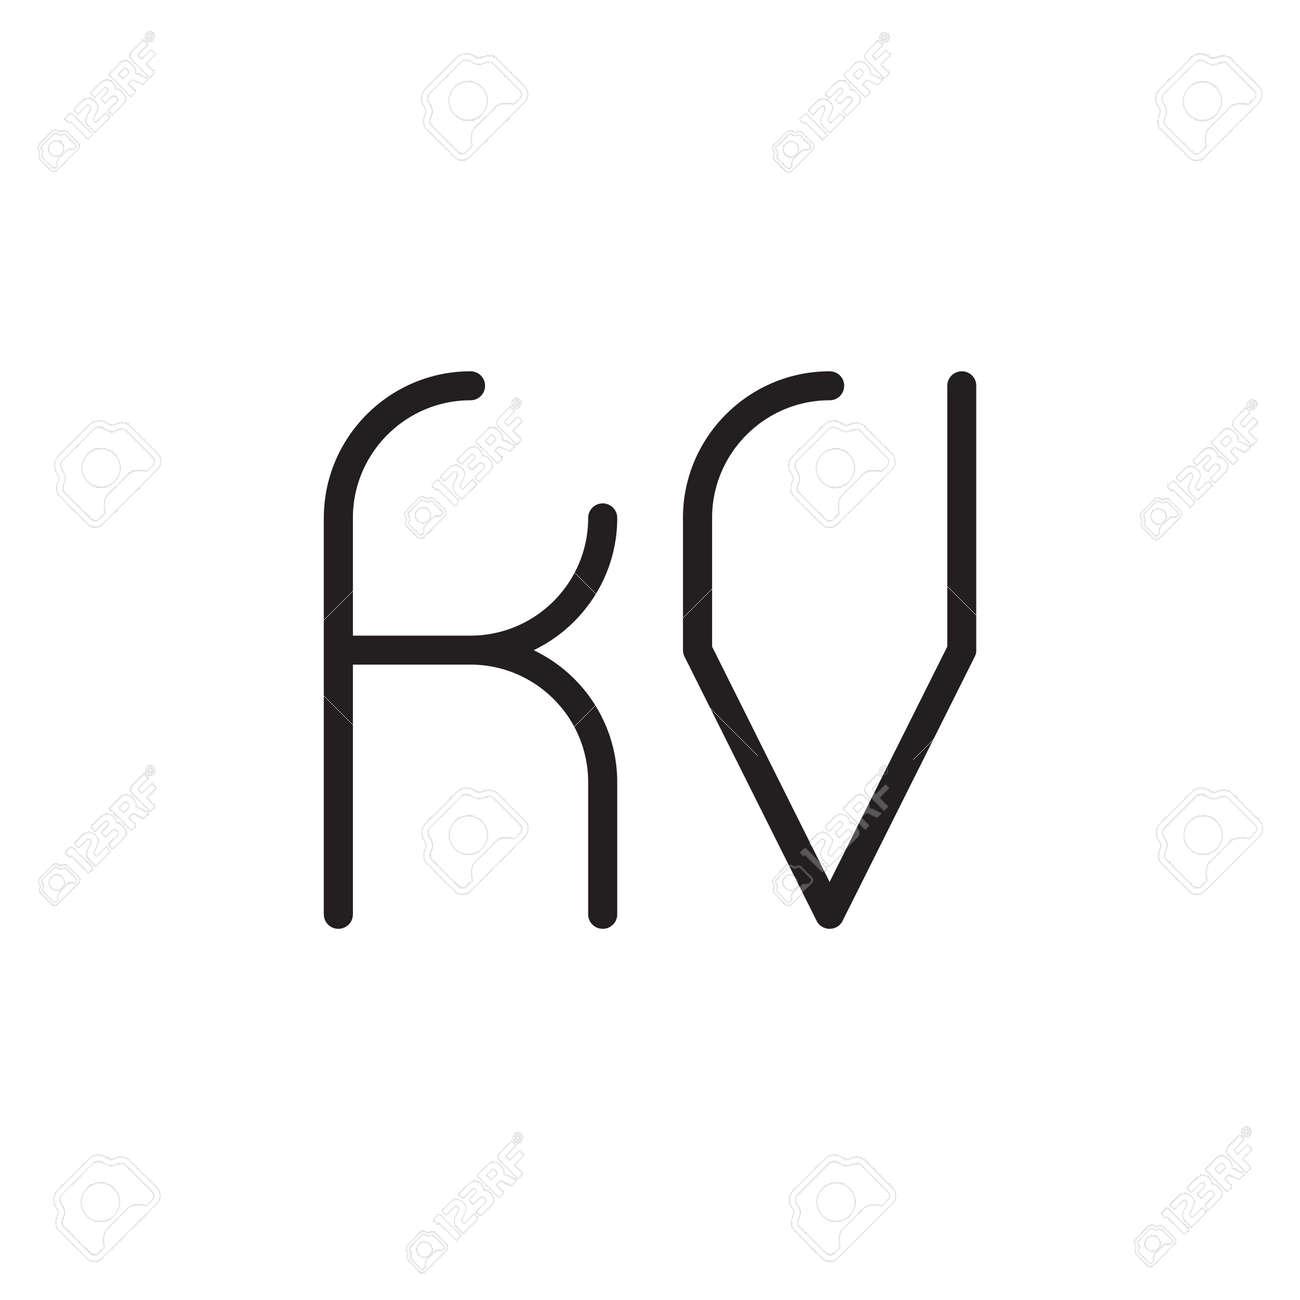 kv initial letter vector logo icon - 164323795